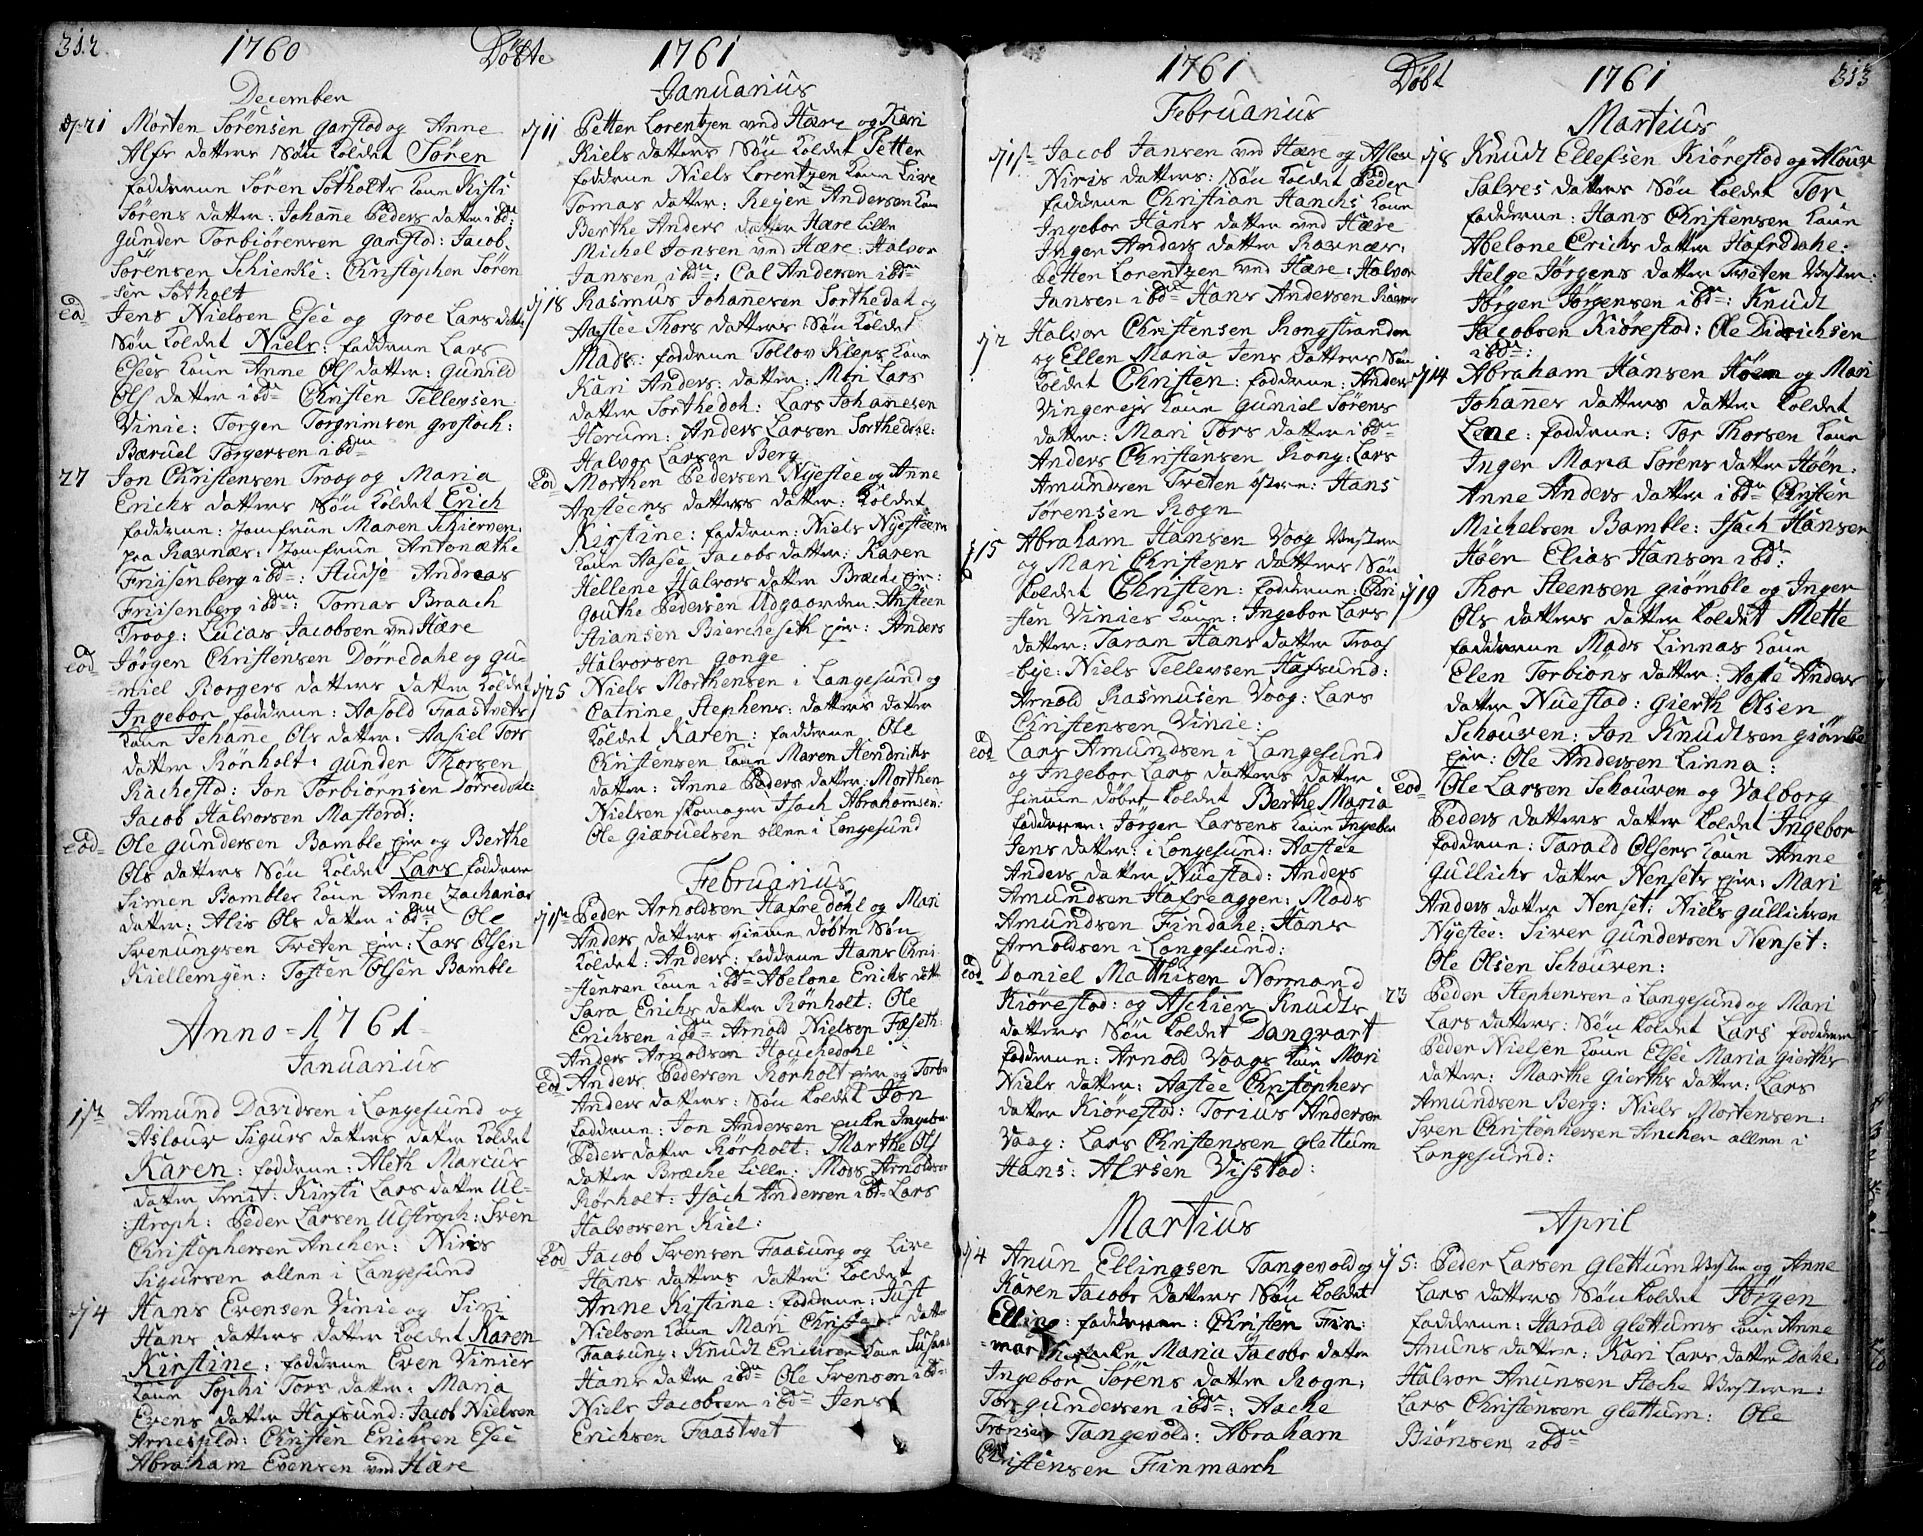 SAKO, Bamble kirkebøker, F/Fa/L0001: Ministerialbok nr. I 1, 1702-1774, s. 312-313